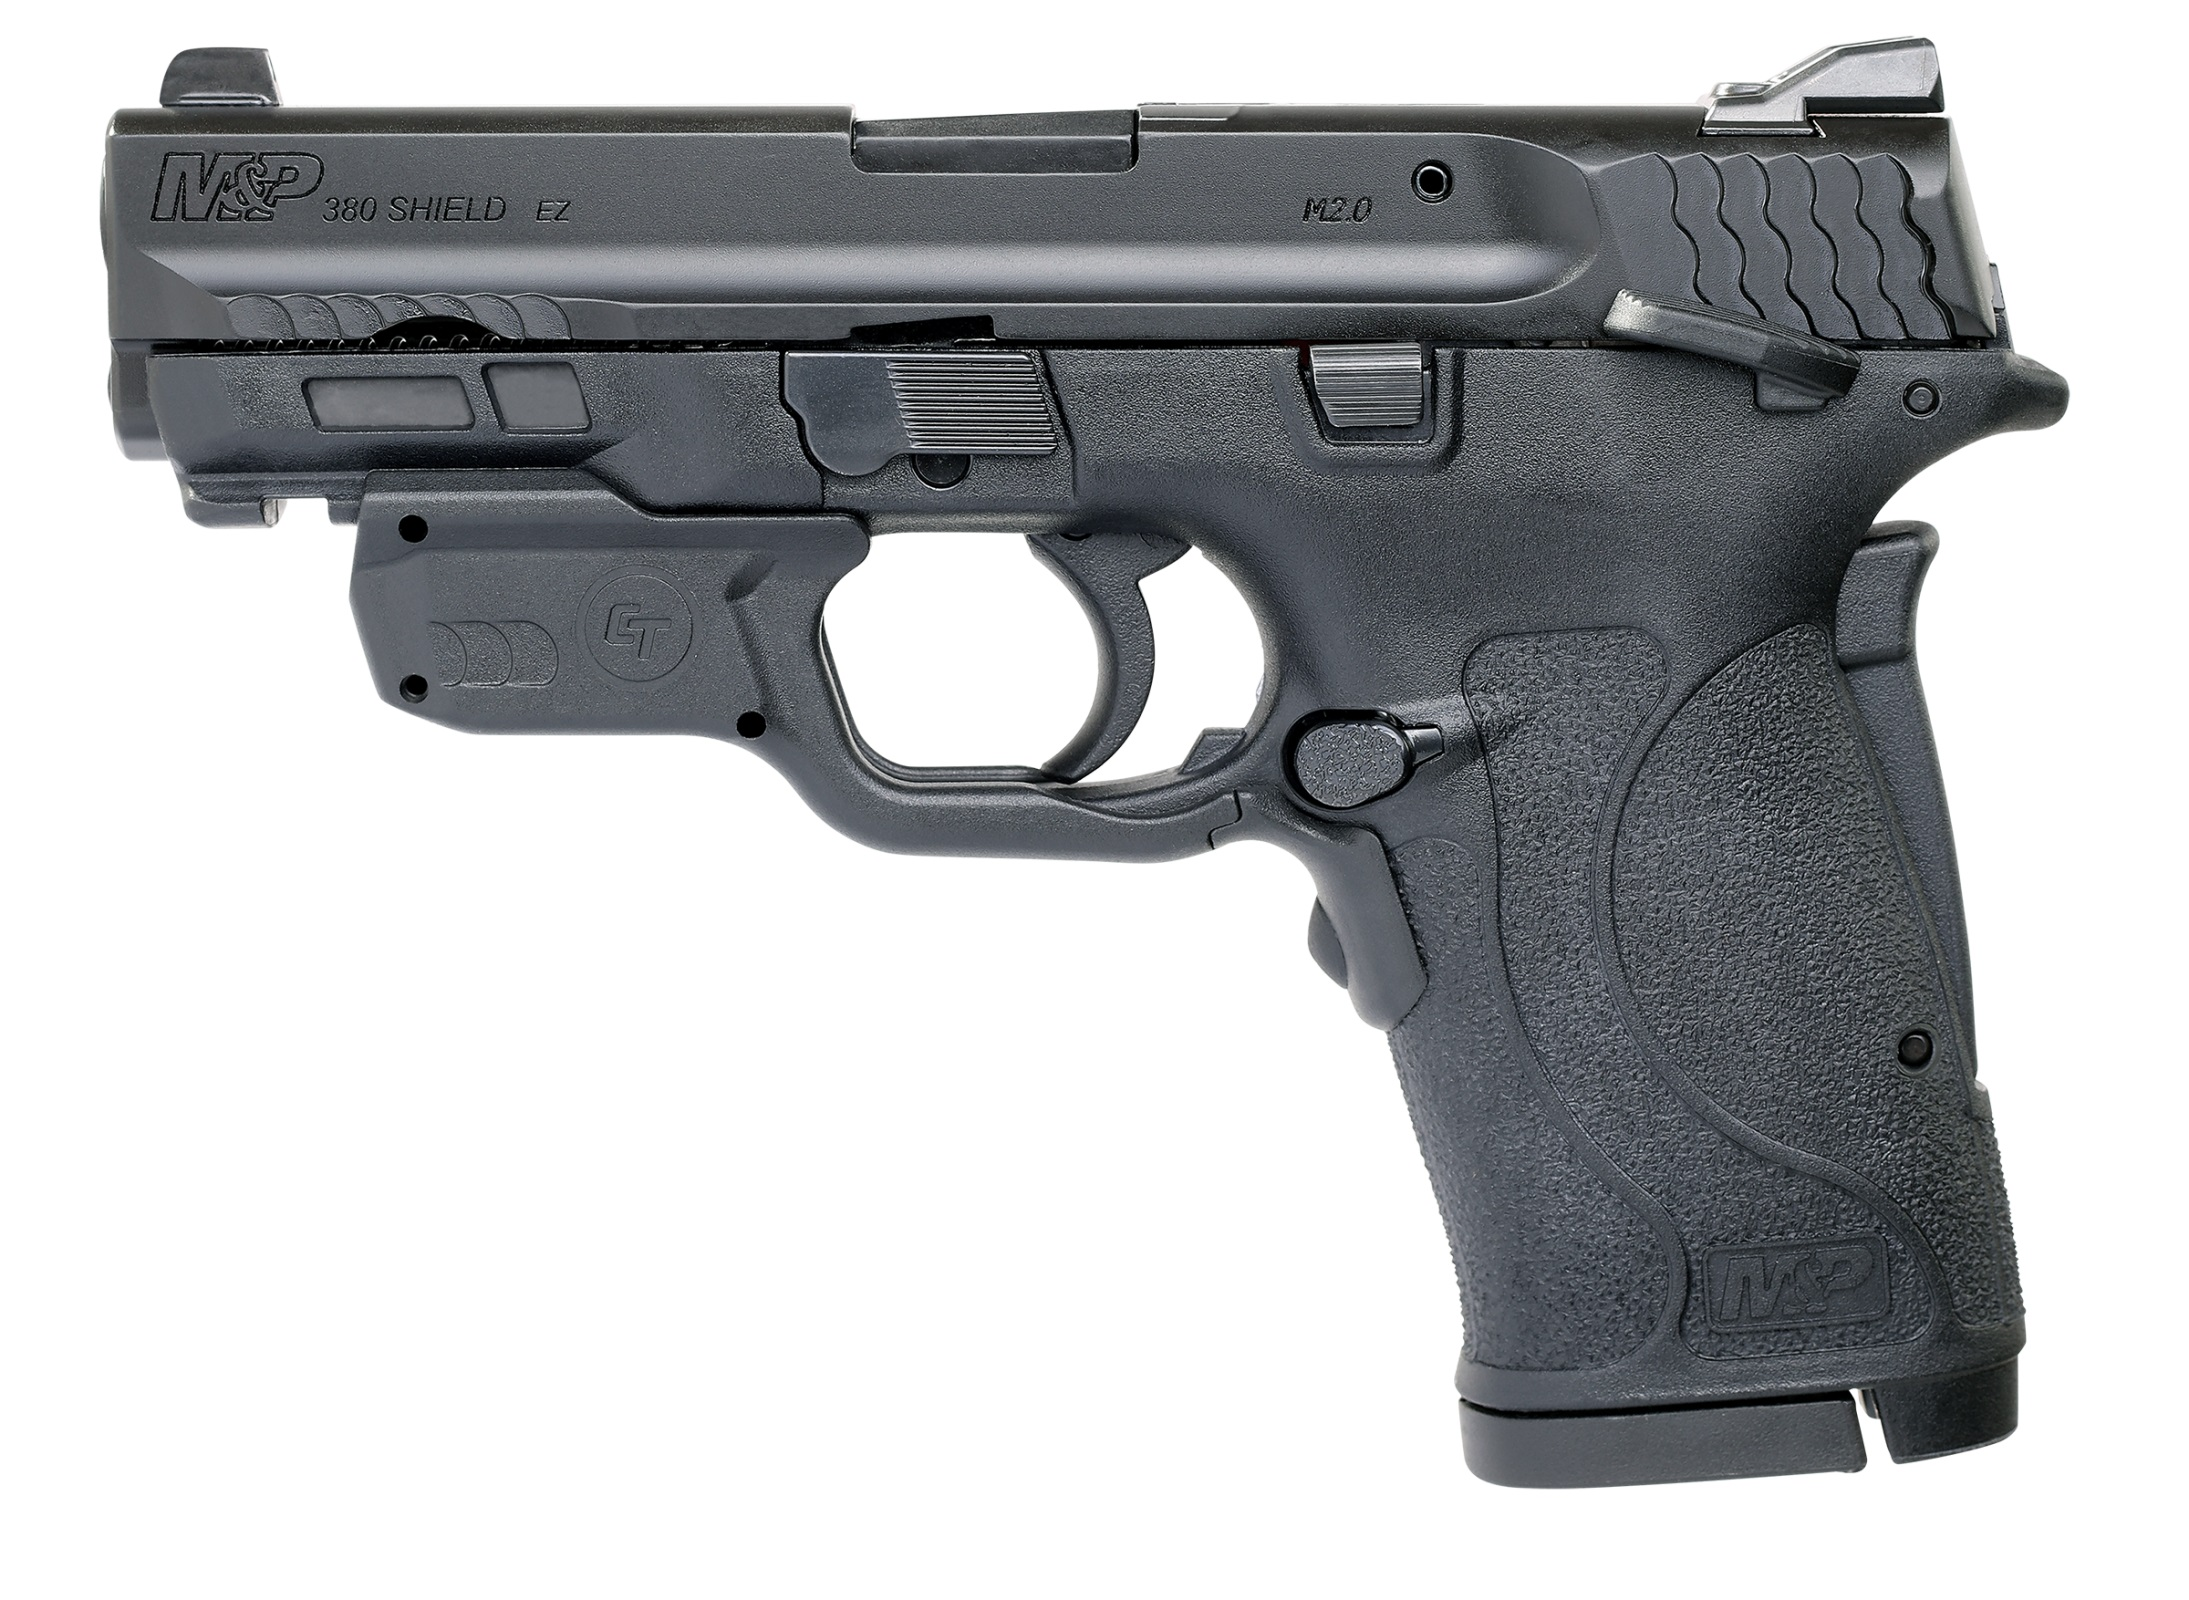 Smith and Wesson M&P380 Shield EZ 380 ACP